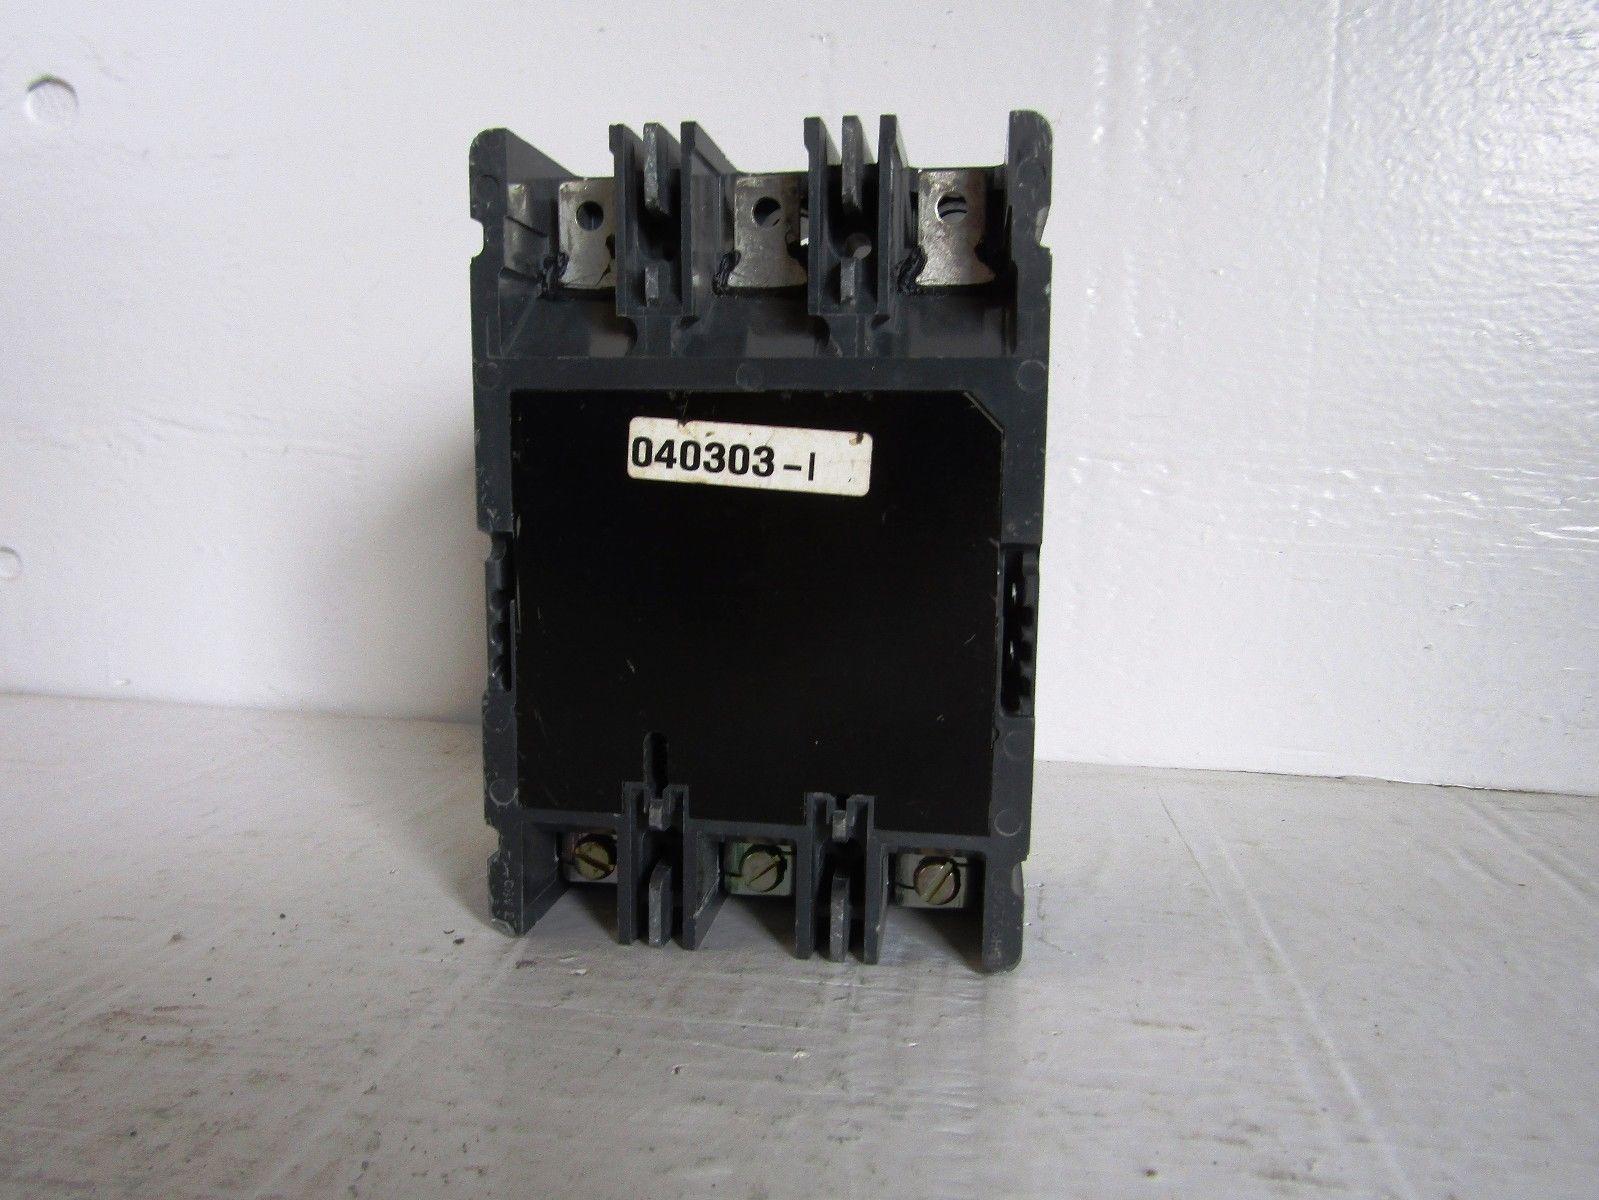 Cutler Hammer HFD3045 600V 45A 3P Industrial Circuit Breaker 331884291374 5?fit\=1599%2C1200\&ssl\=1 emergi lite wiring diagram wiring diagrams emergency lighting ctu wiring diagram at eliteediting.co